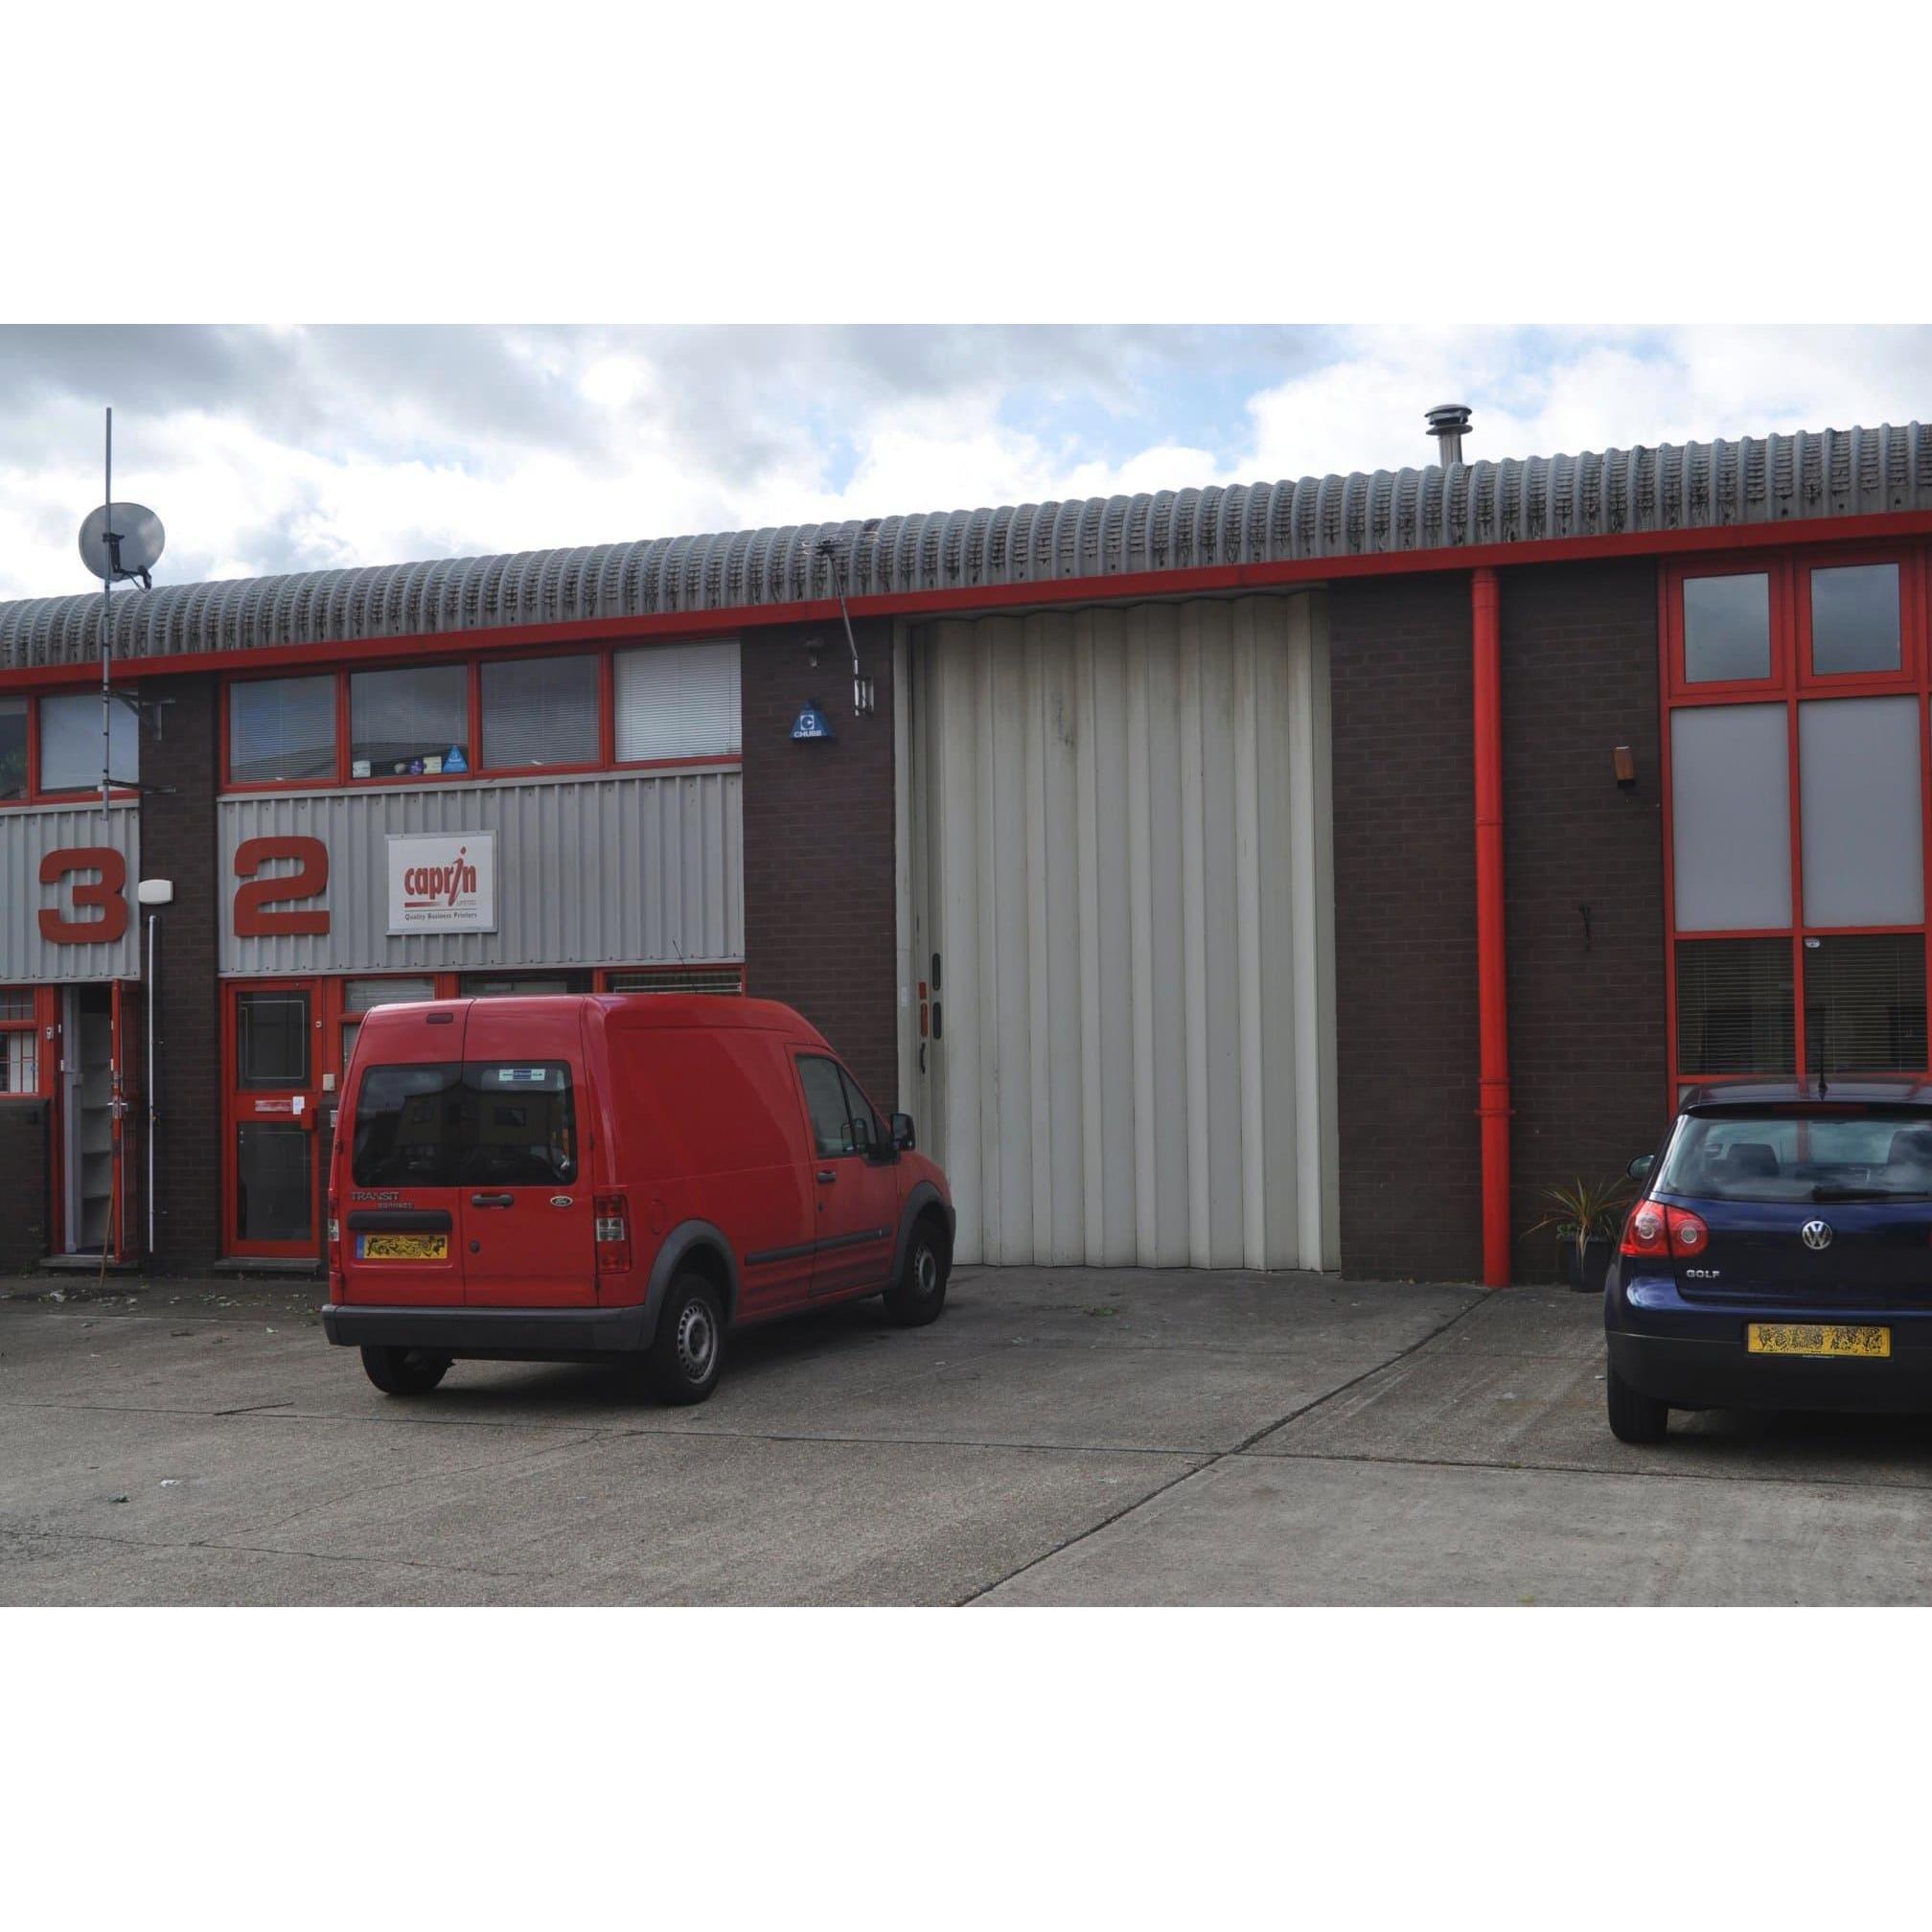 Caprin Ltd - St. Albans, Hertfordshire AL2 2DR - 01727 872021 | ShowMeLocal.com